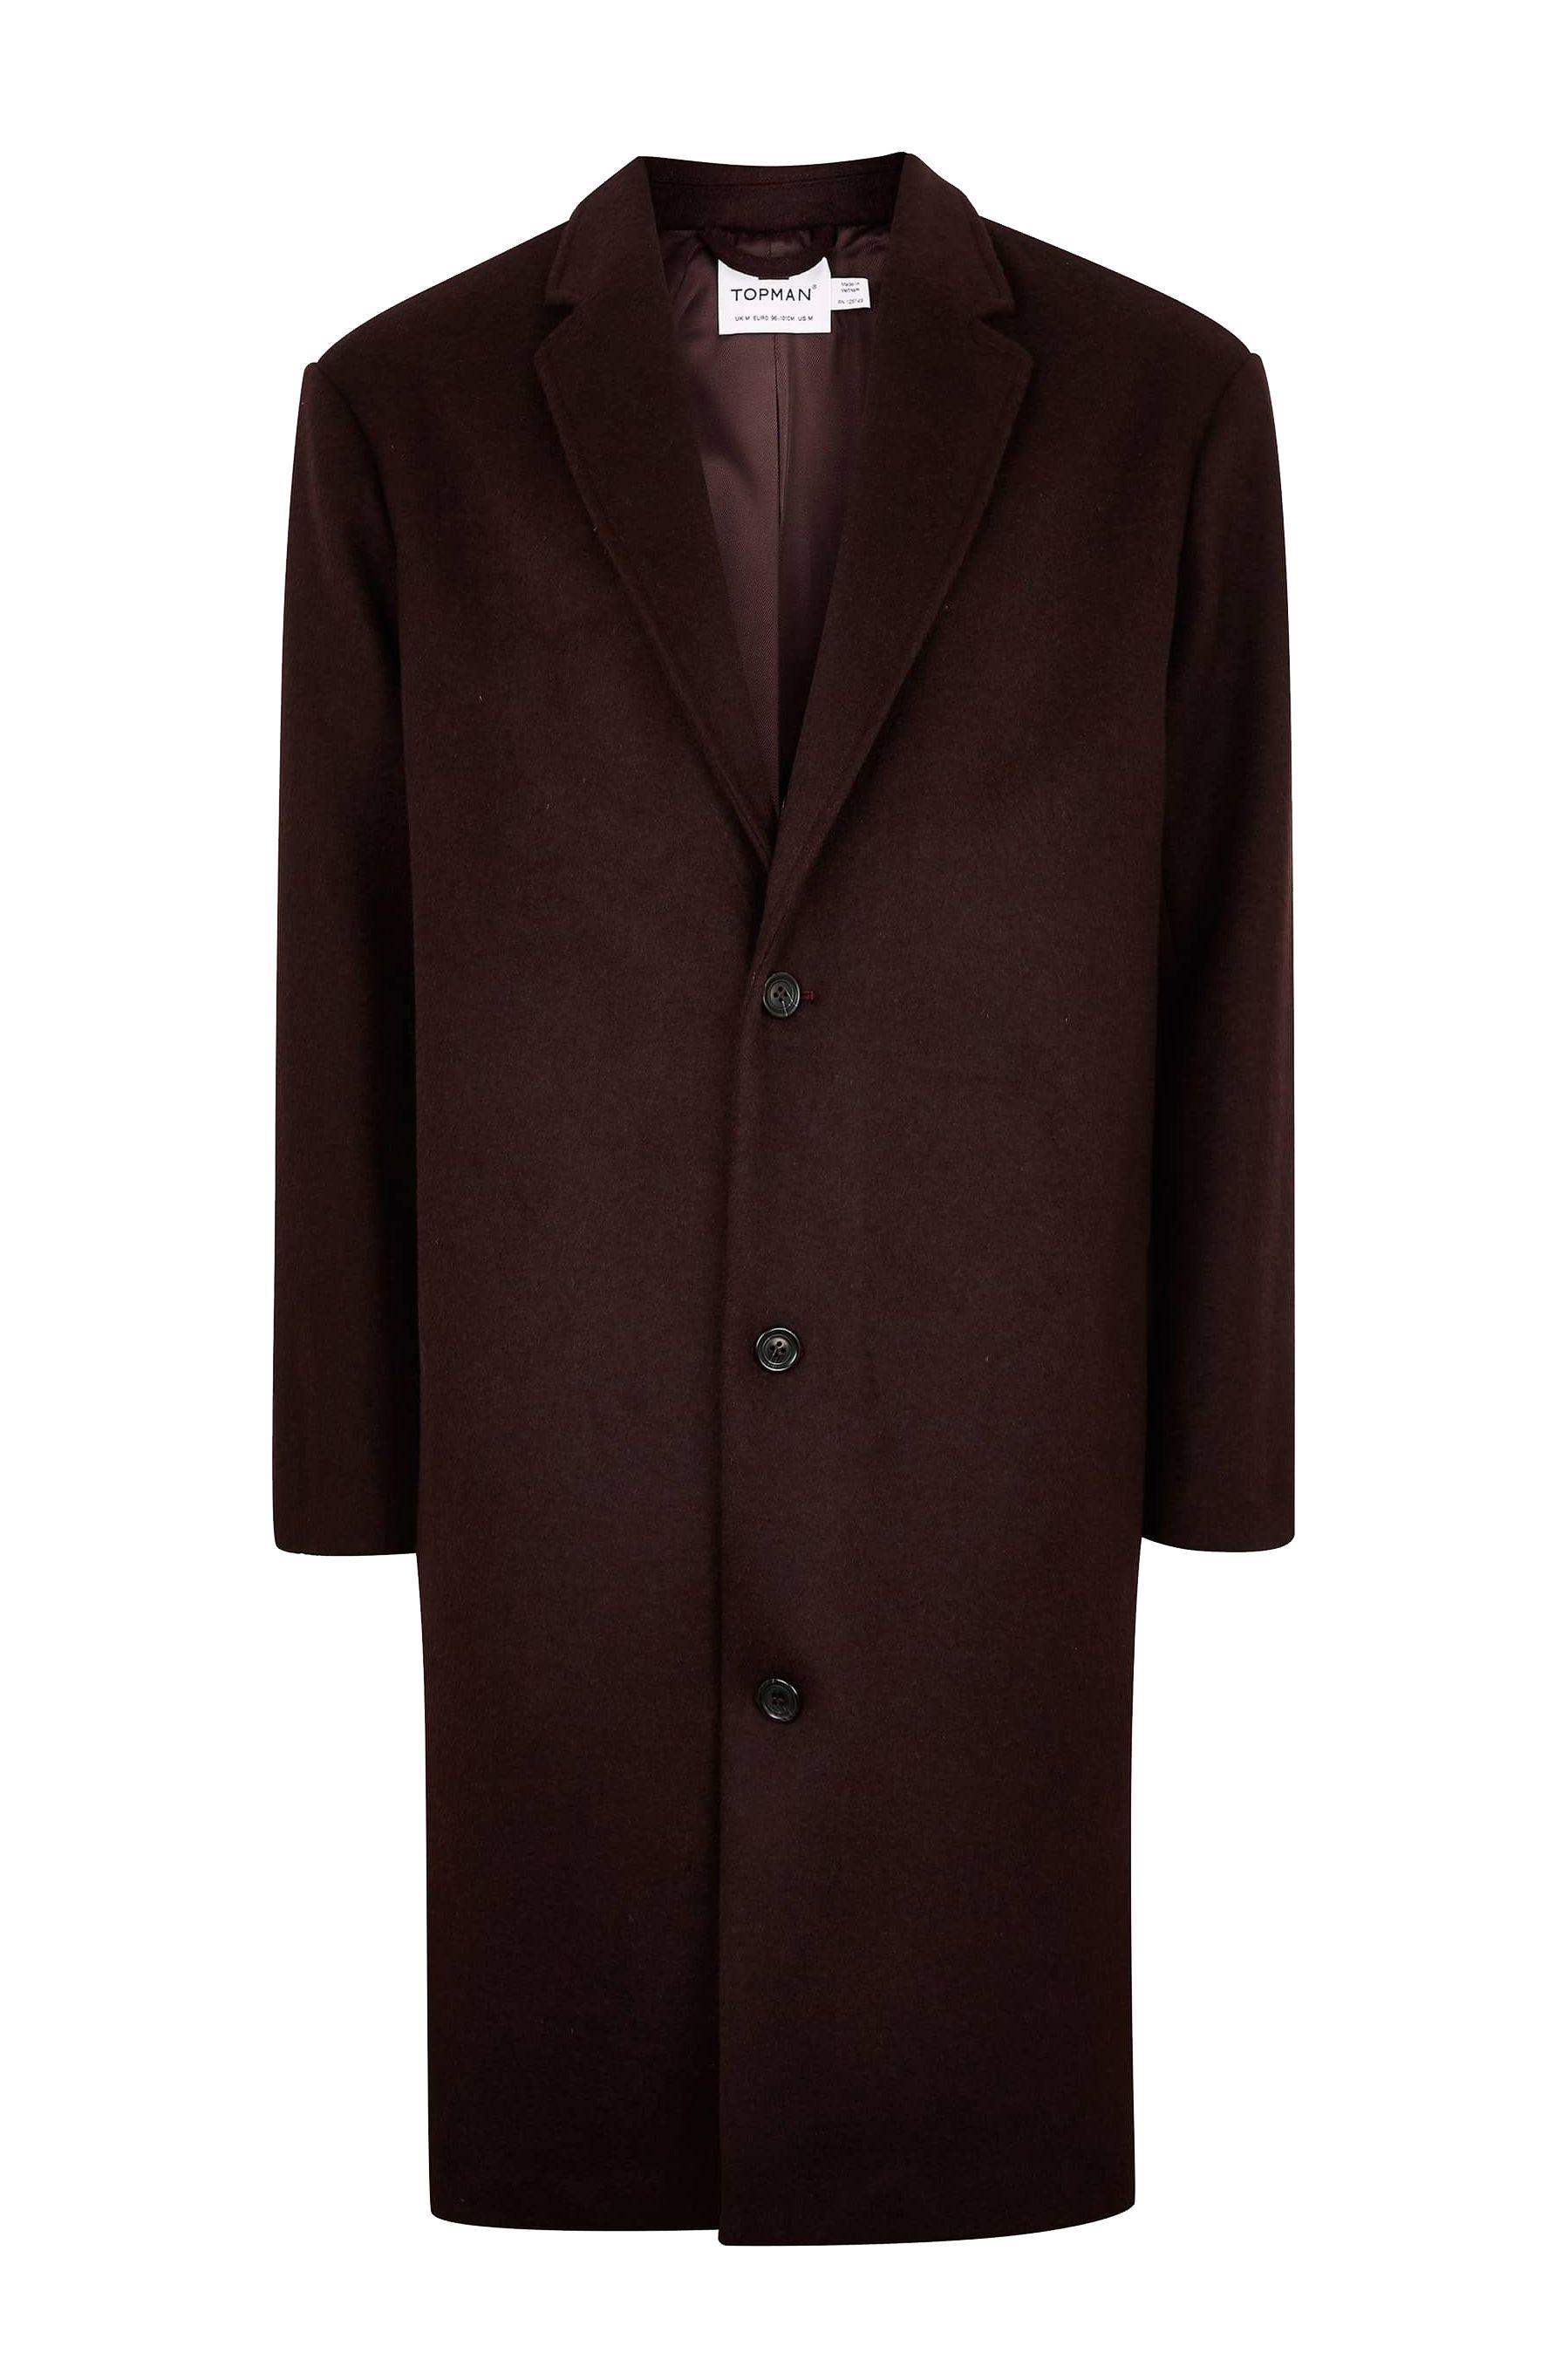 04178bace The Oversized Overcoat